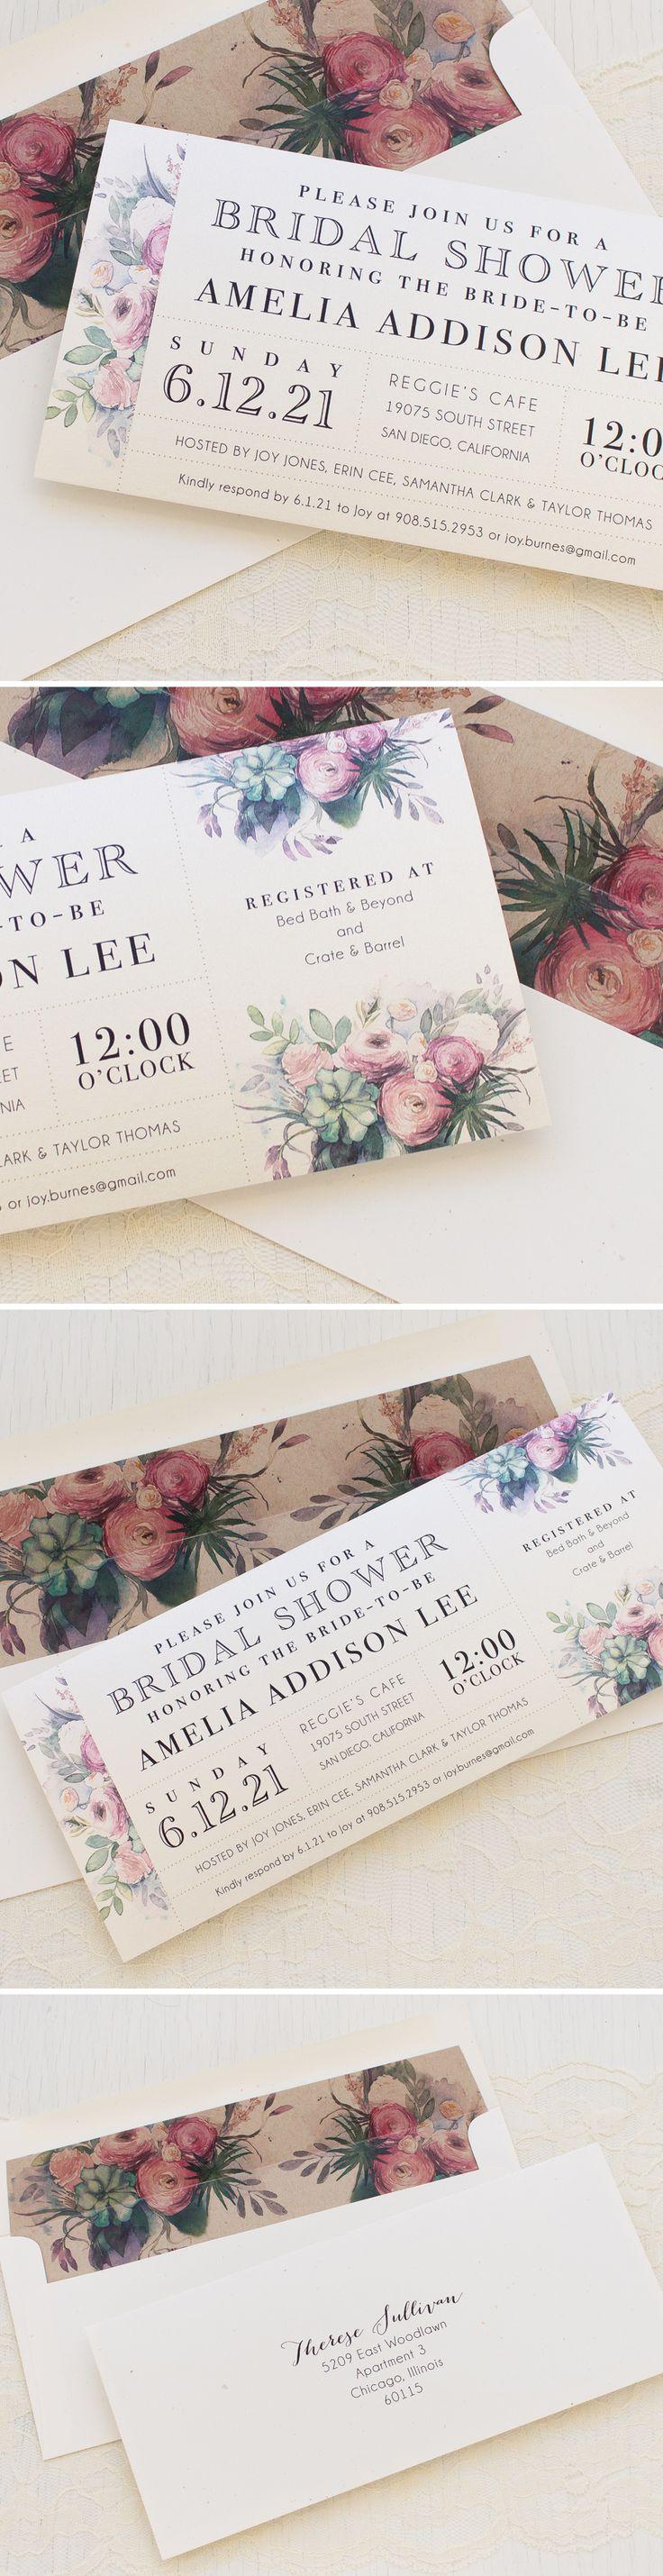 47 Best Bridal Shower Invitations Images On Pinterest Bachelorette